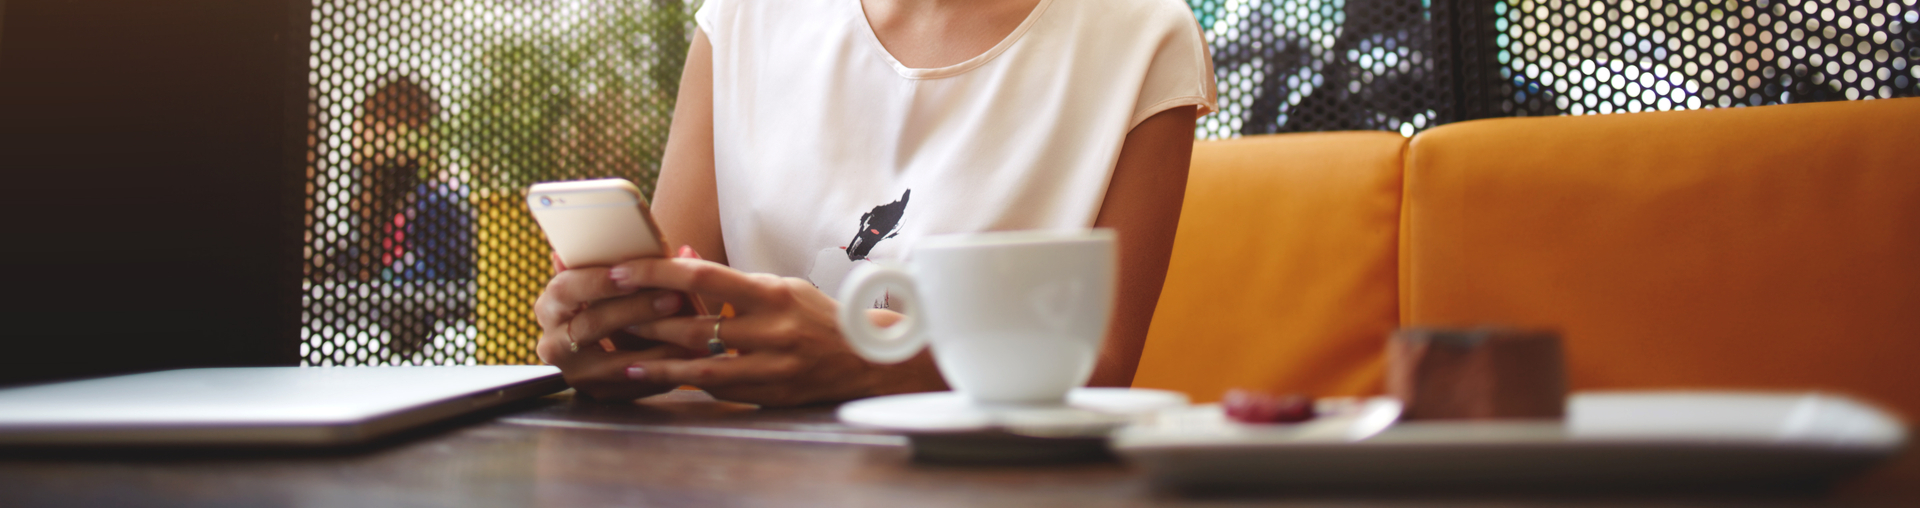 industria horeca cafenea